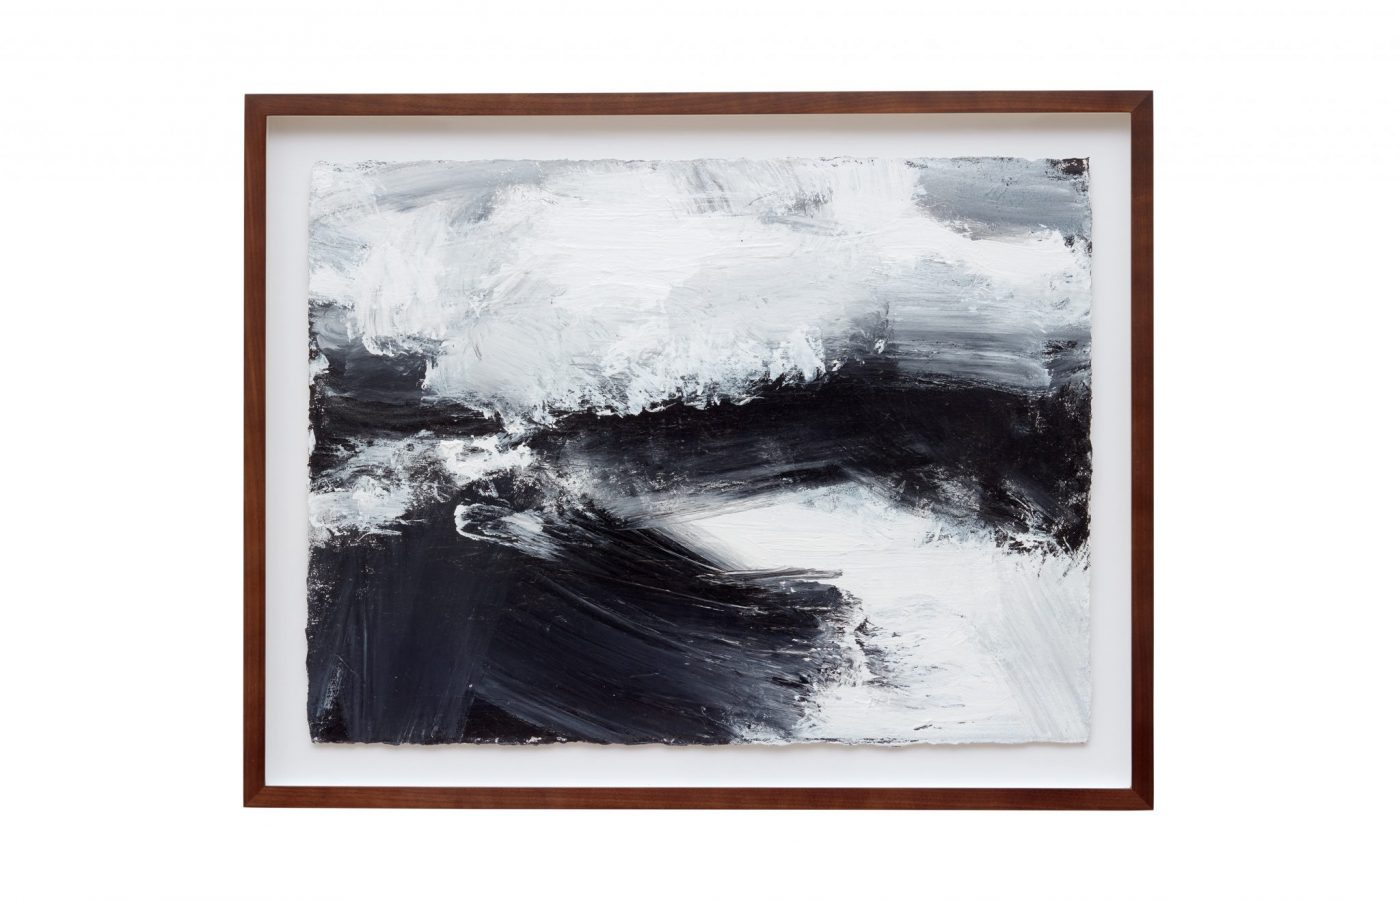 FXF18-16 John Virtue Untitled No 3 2014